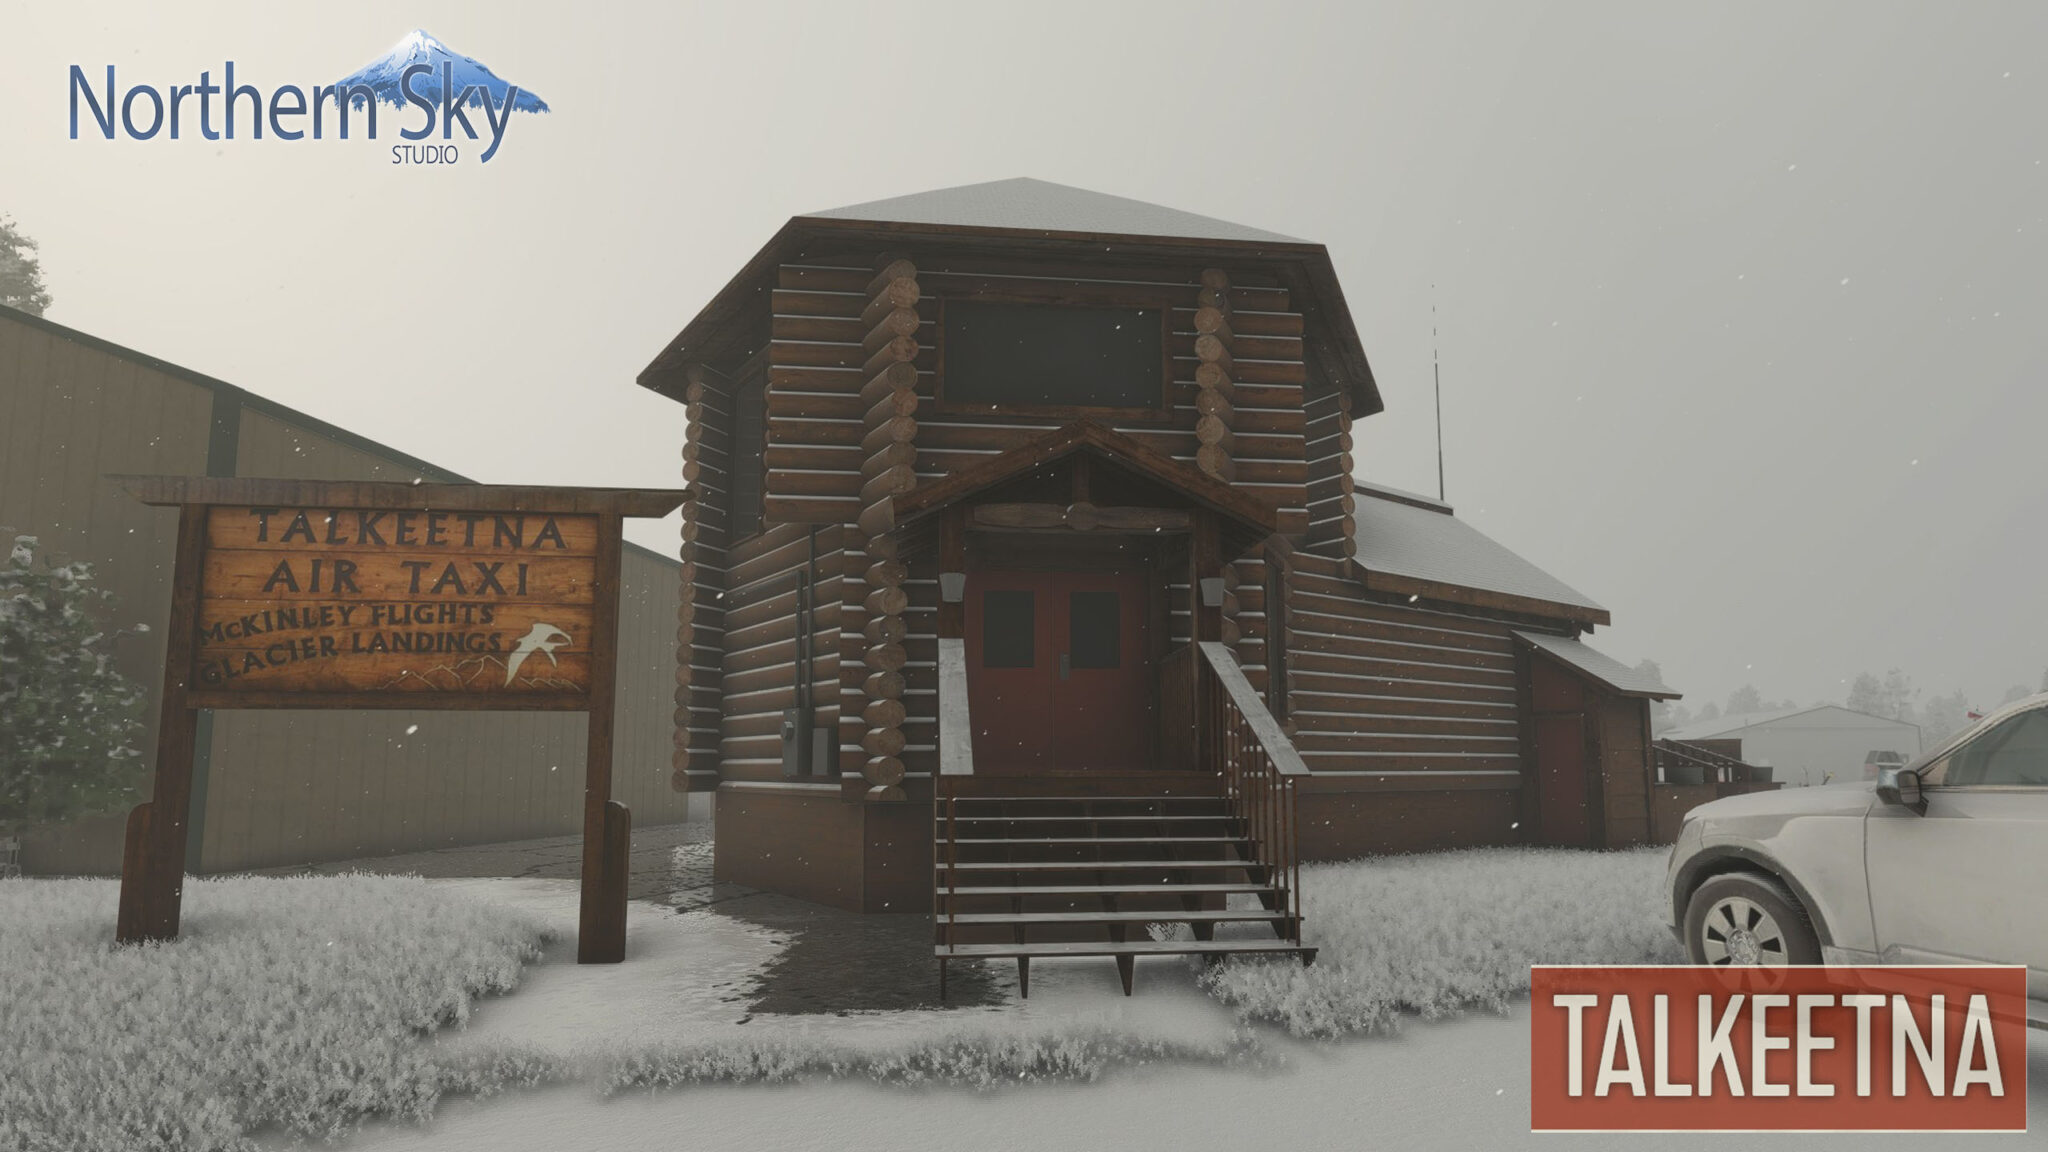 Northern Sky Studio – Talkeetna, Molokai, Kapalua for MSFS